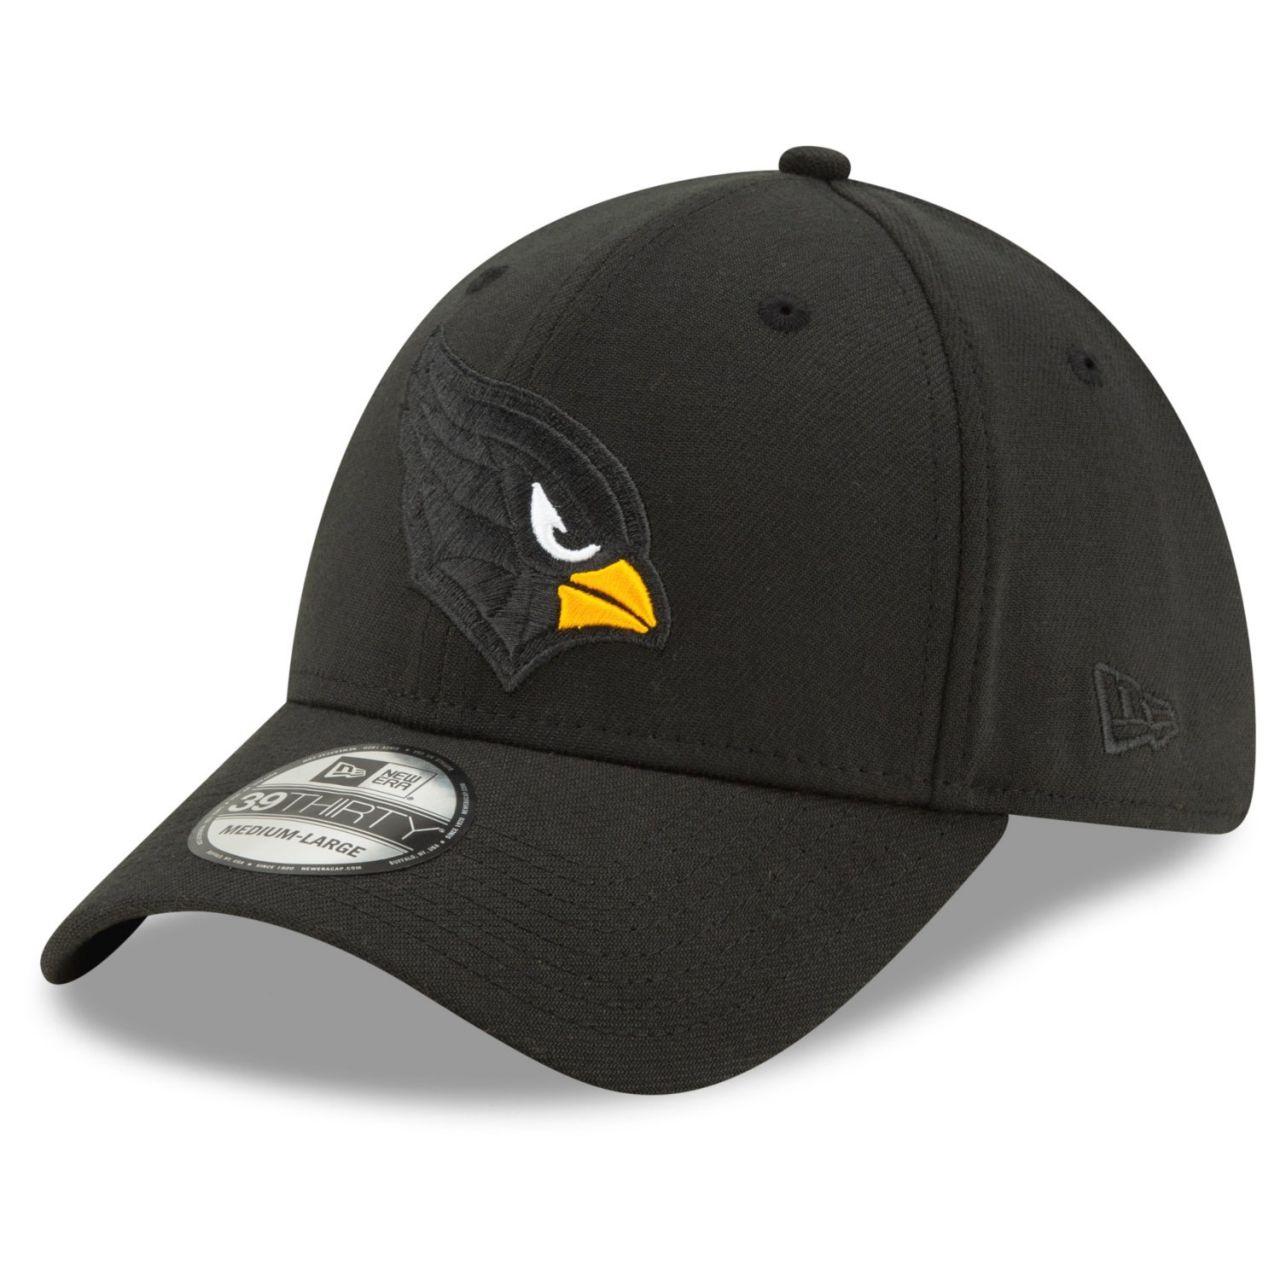 amfoo - New Era 39Thirty Stretch Cap - ELEMENTS Arizona Cardinals